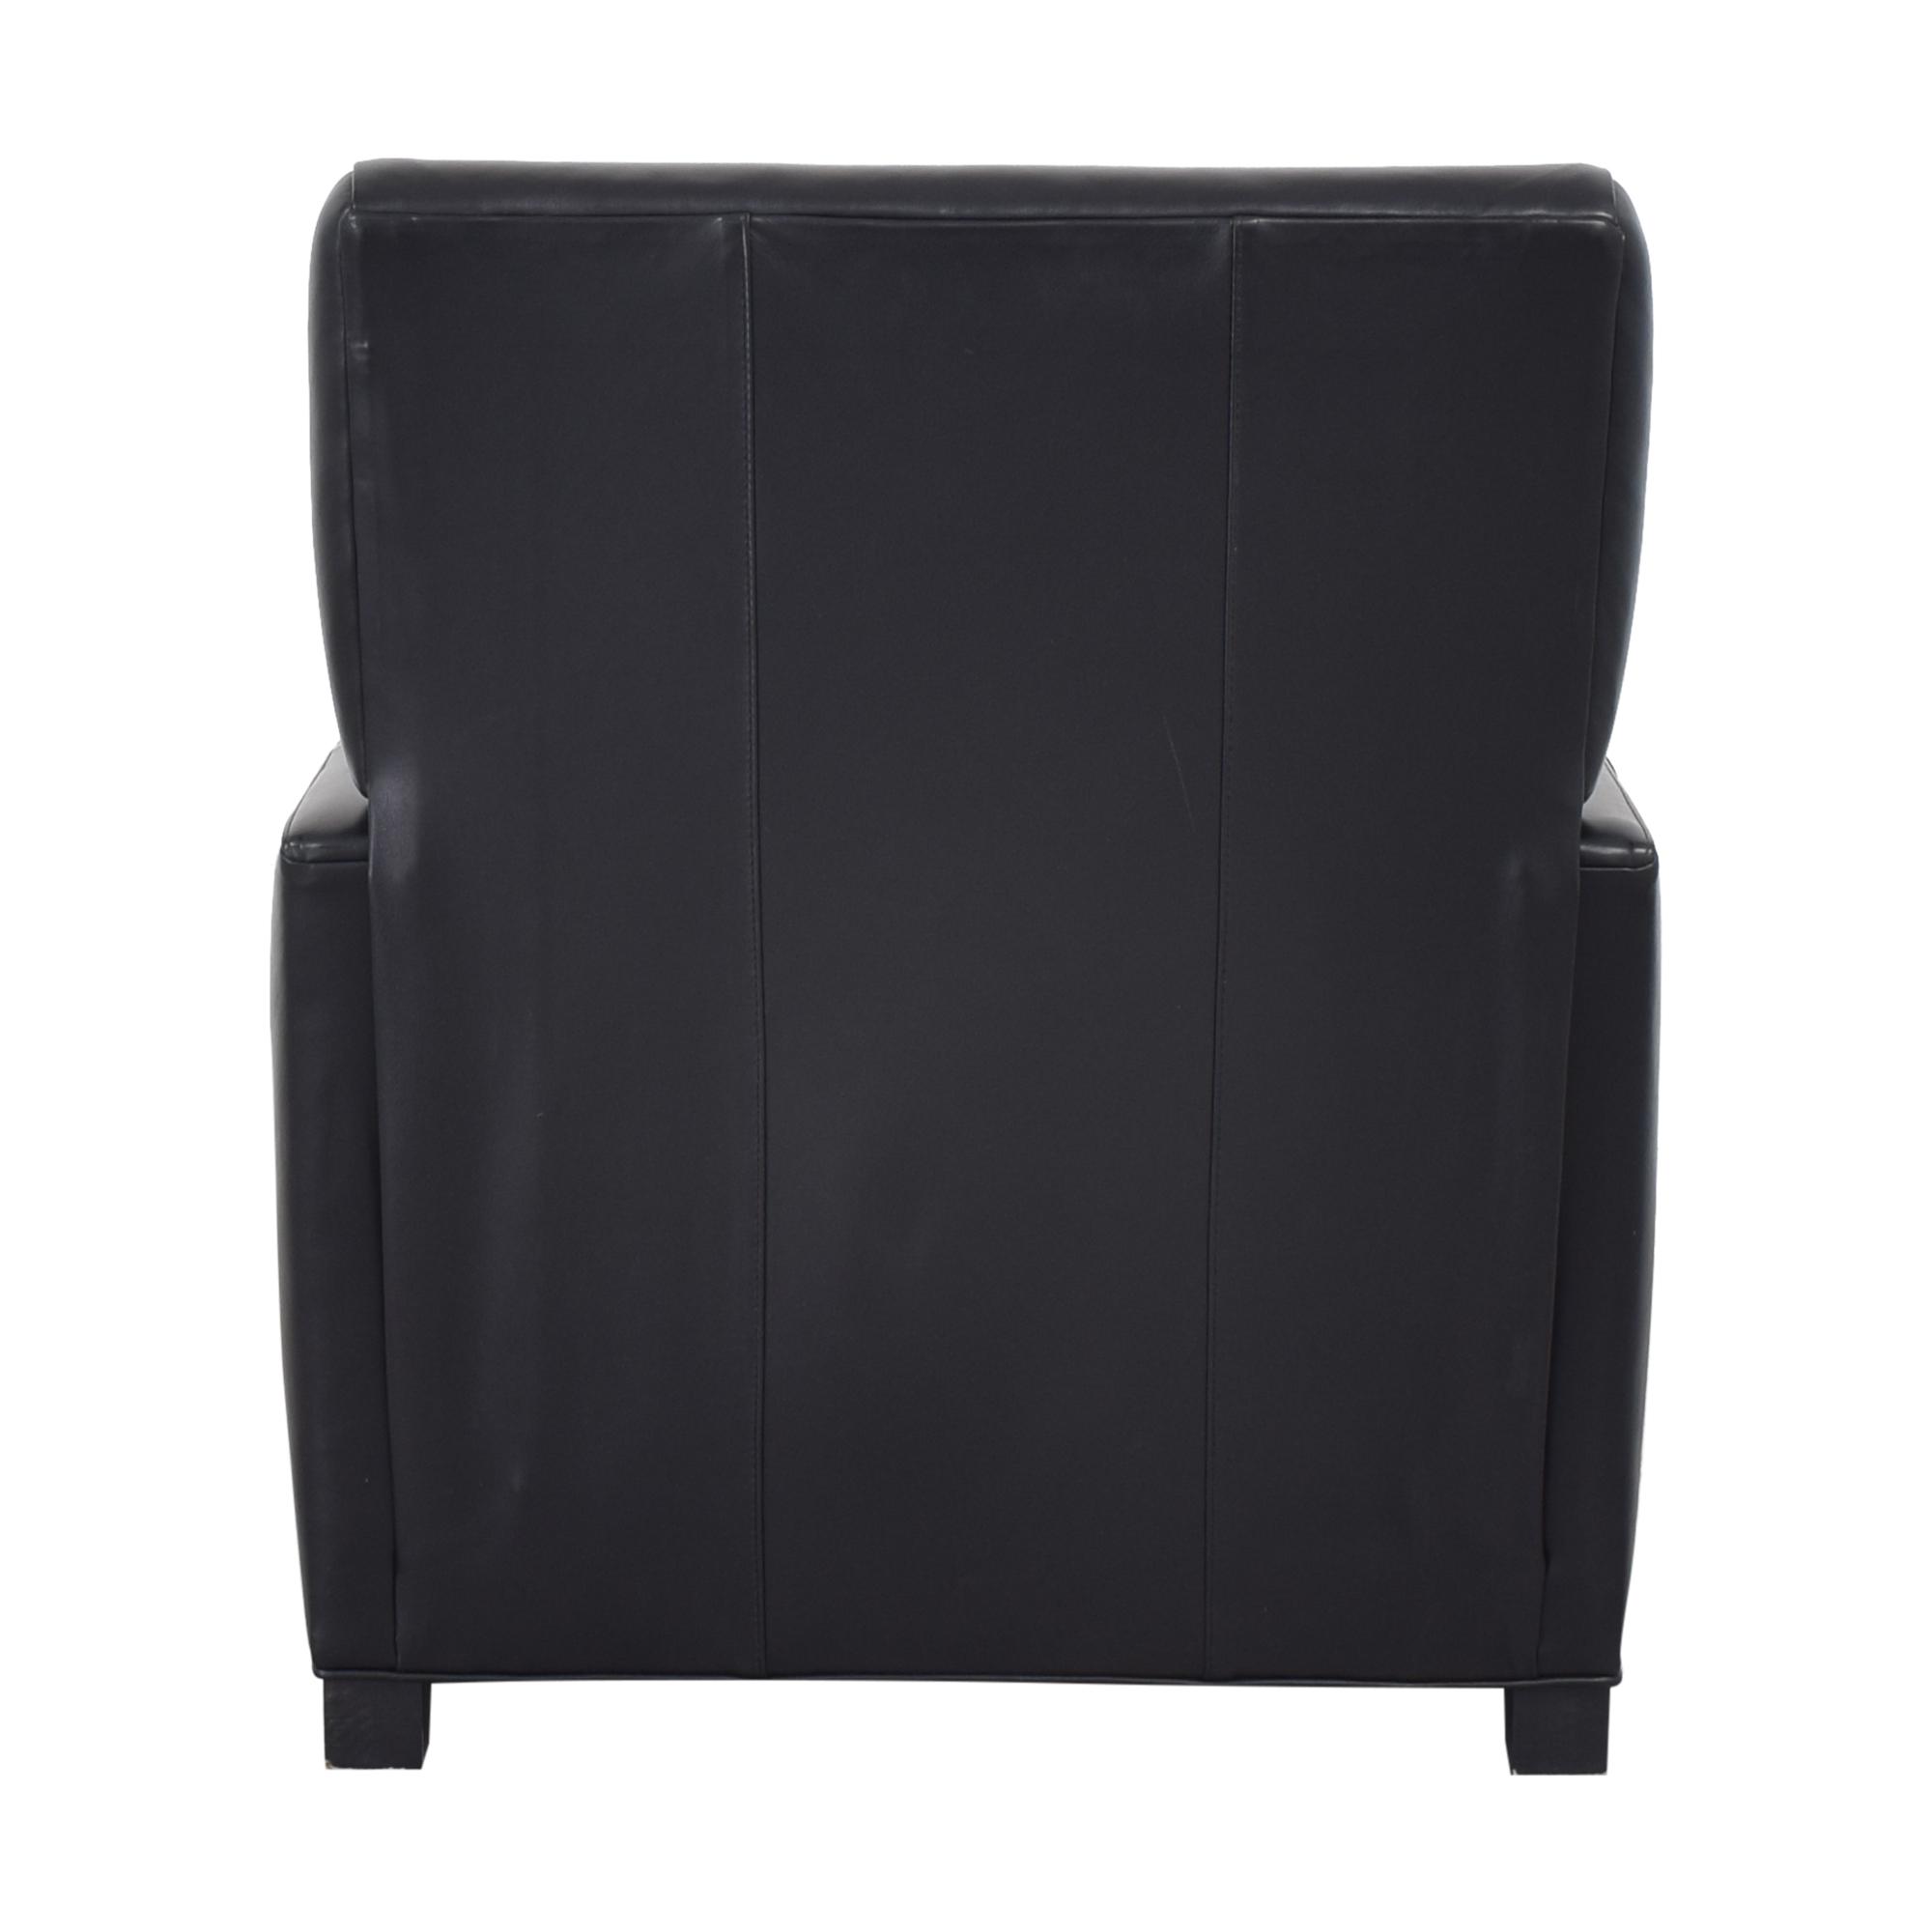 Crate & Barrel Crate & Barrel Tracy Leather Recliner dimensions